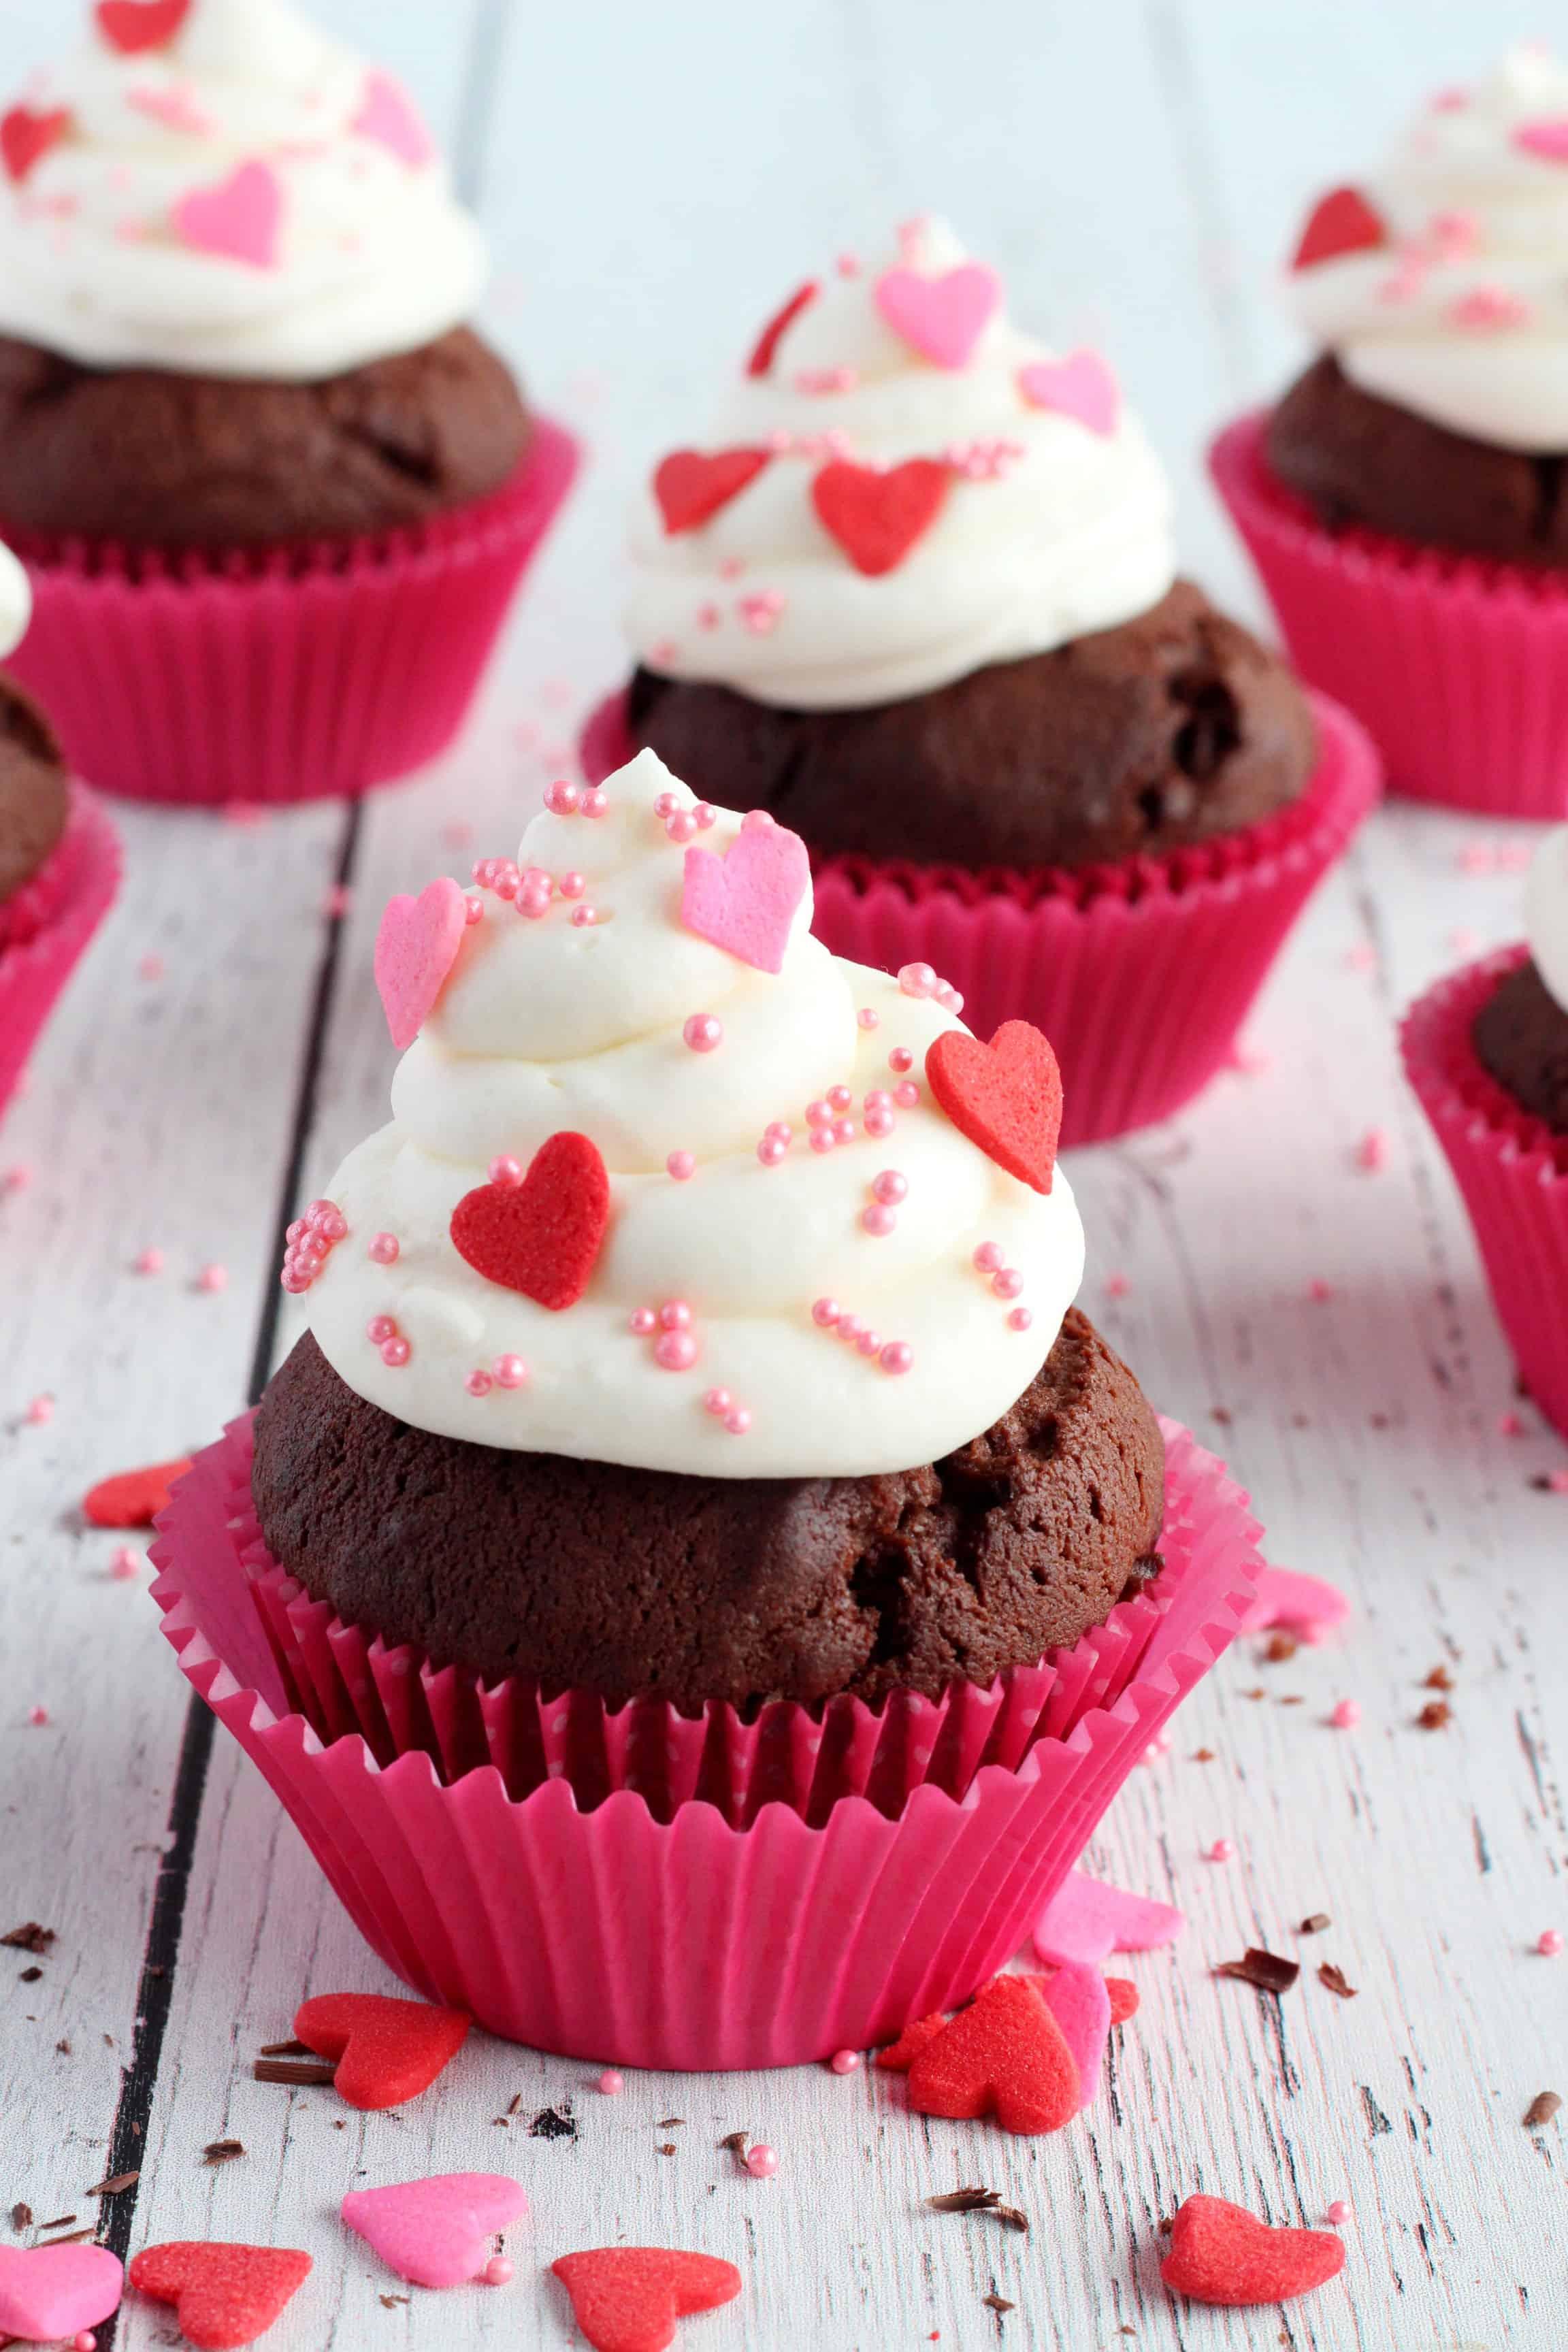 Valentine's chocolate cupcakes